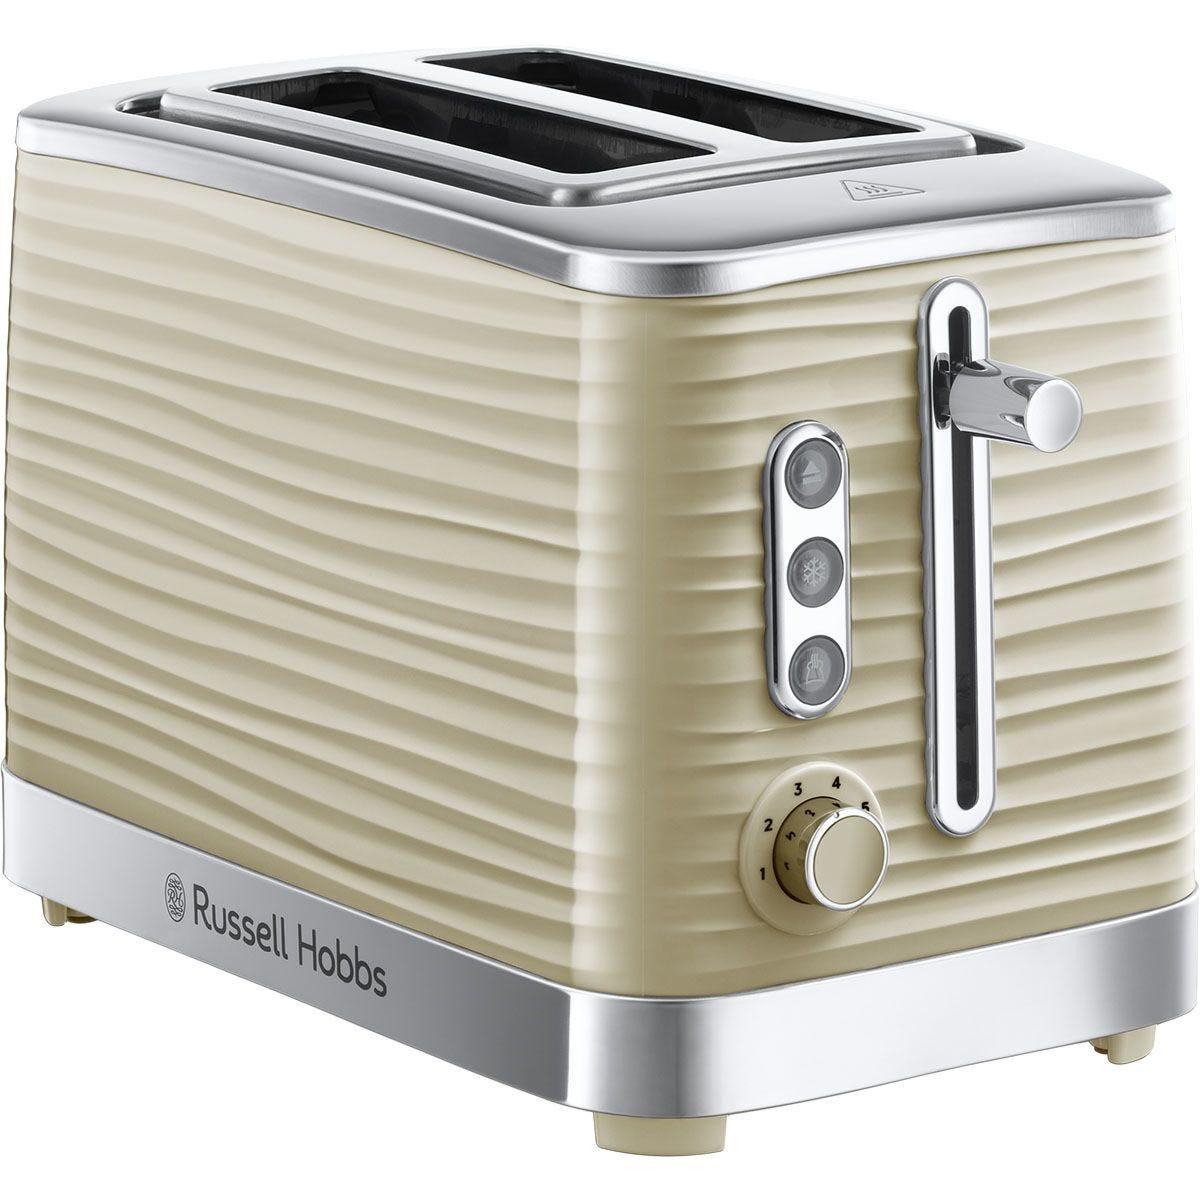 Russell Hobbs Inspire 2-Slice Toaster - Cream